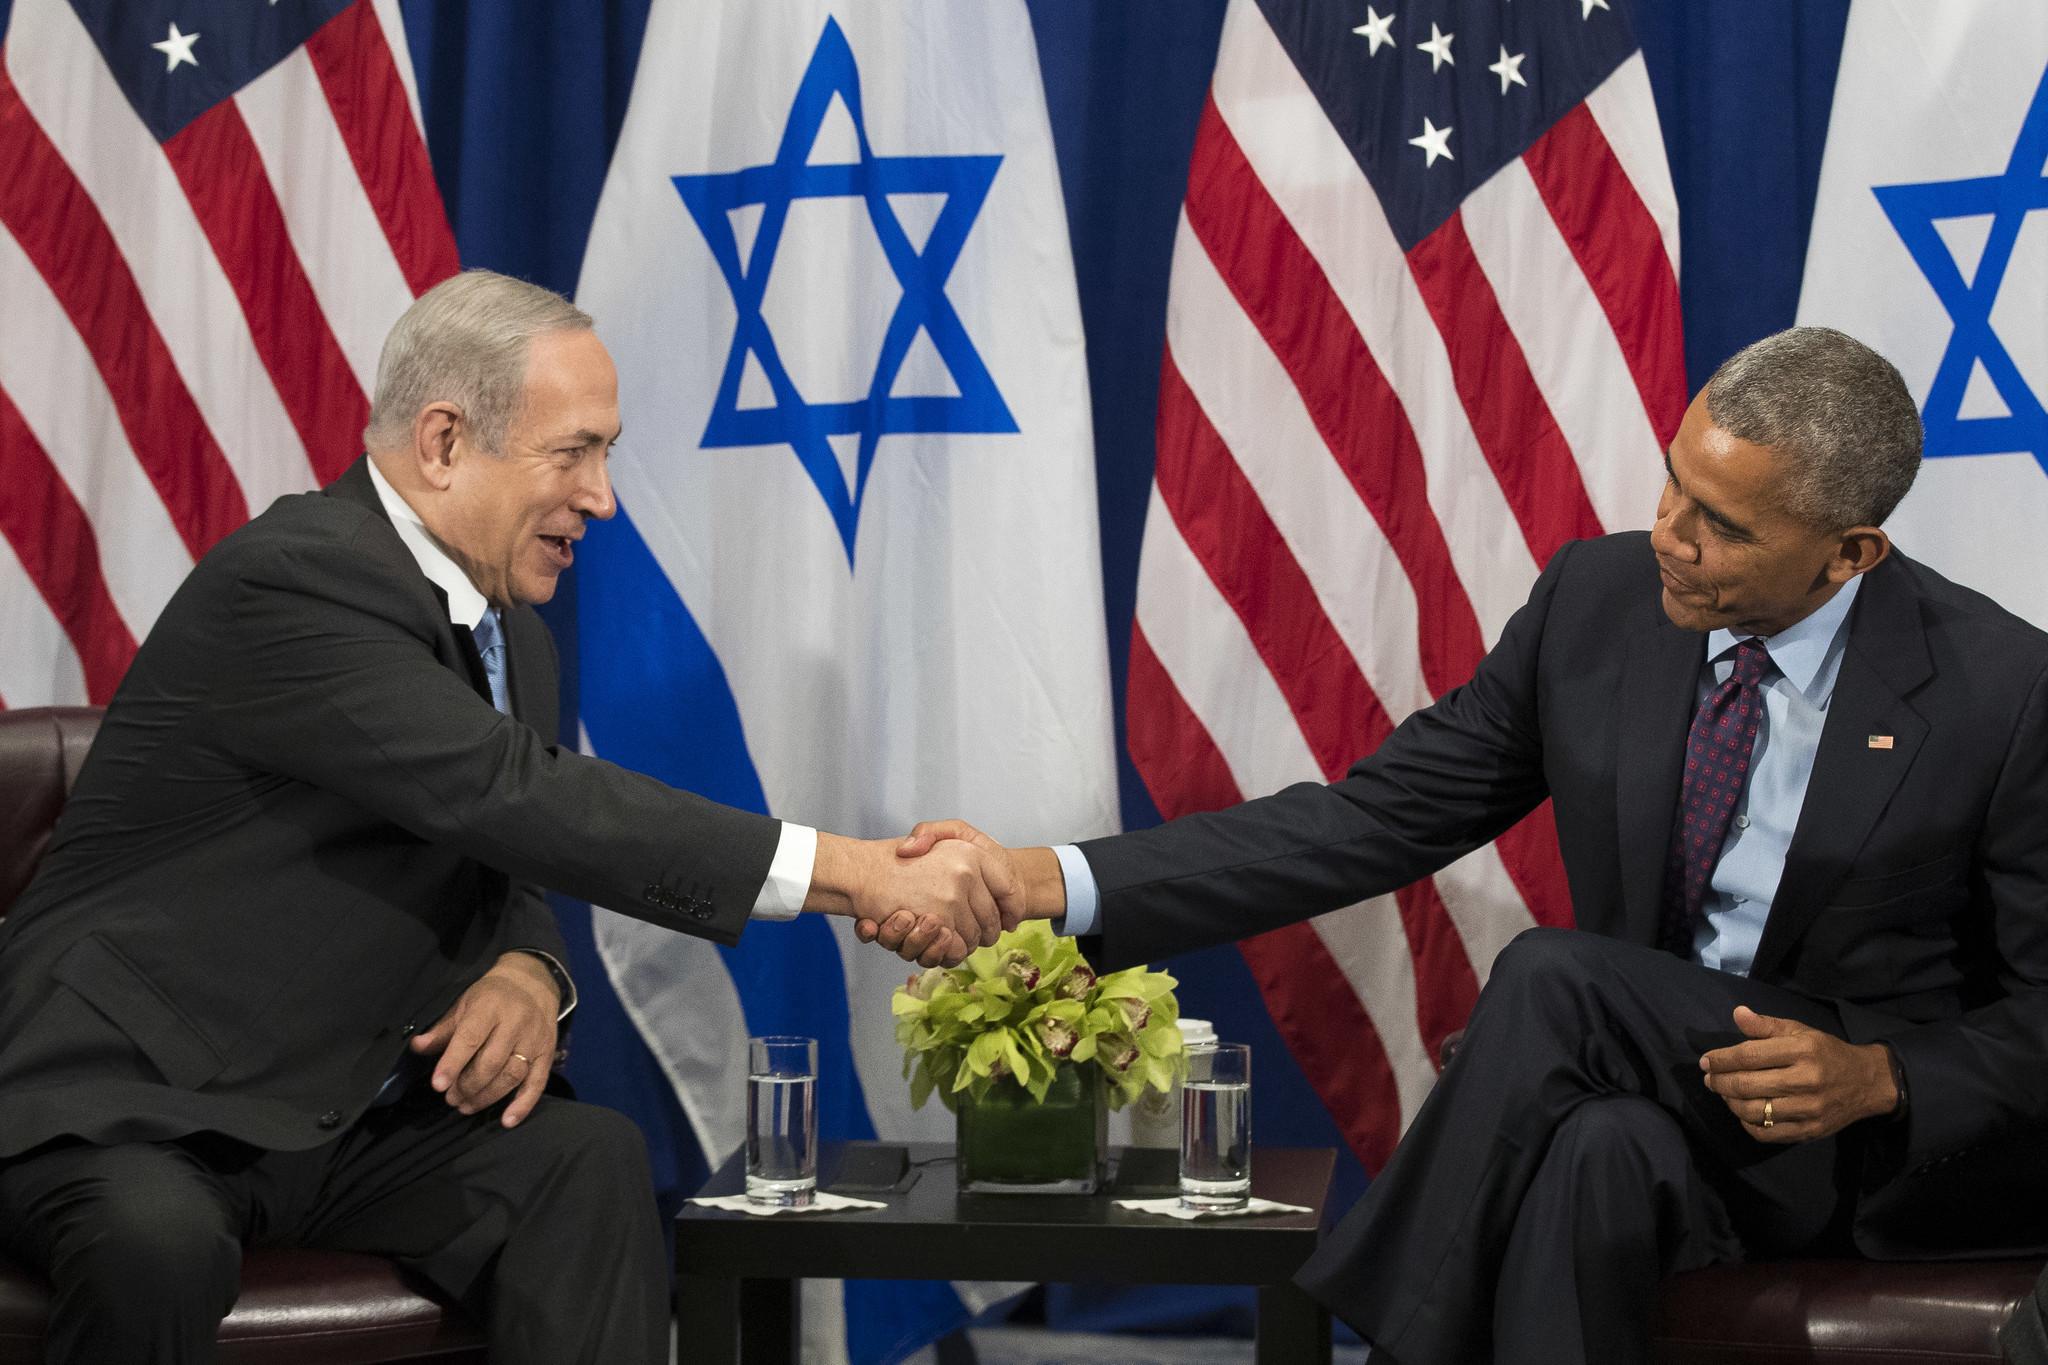 netanyahu and obama relationship with putin